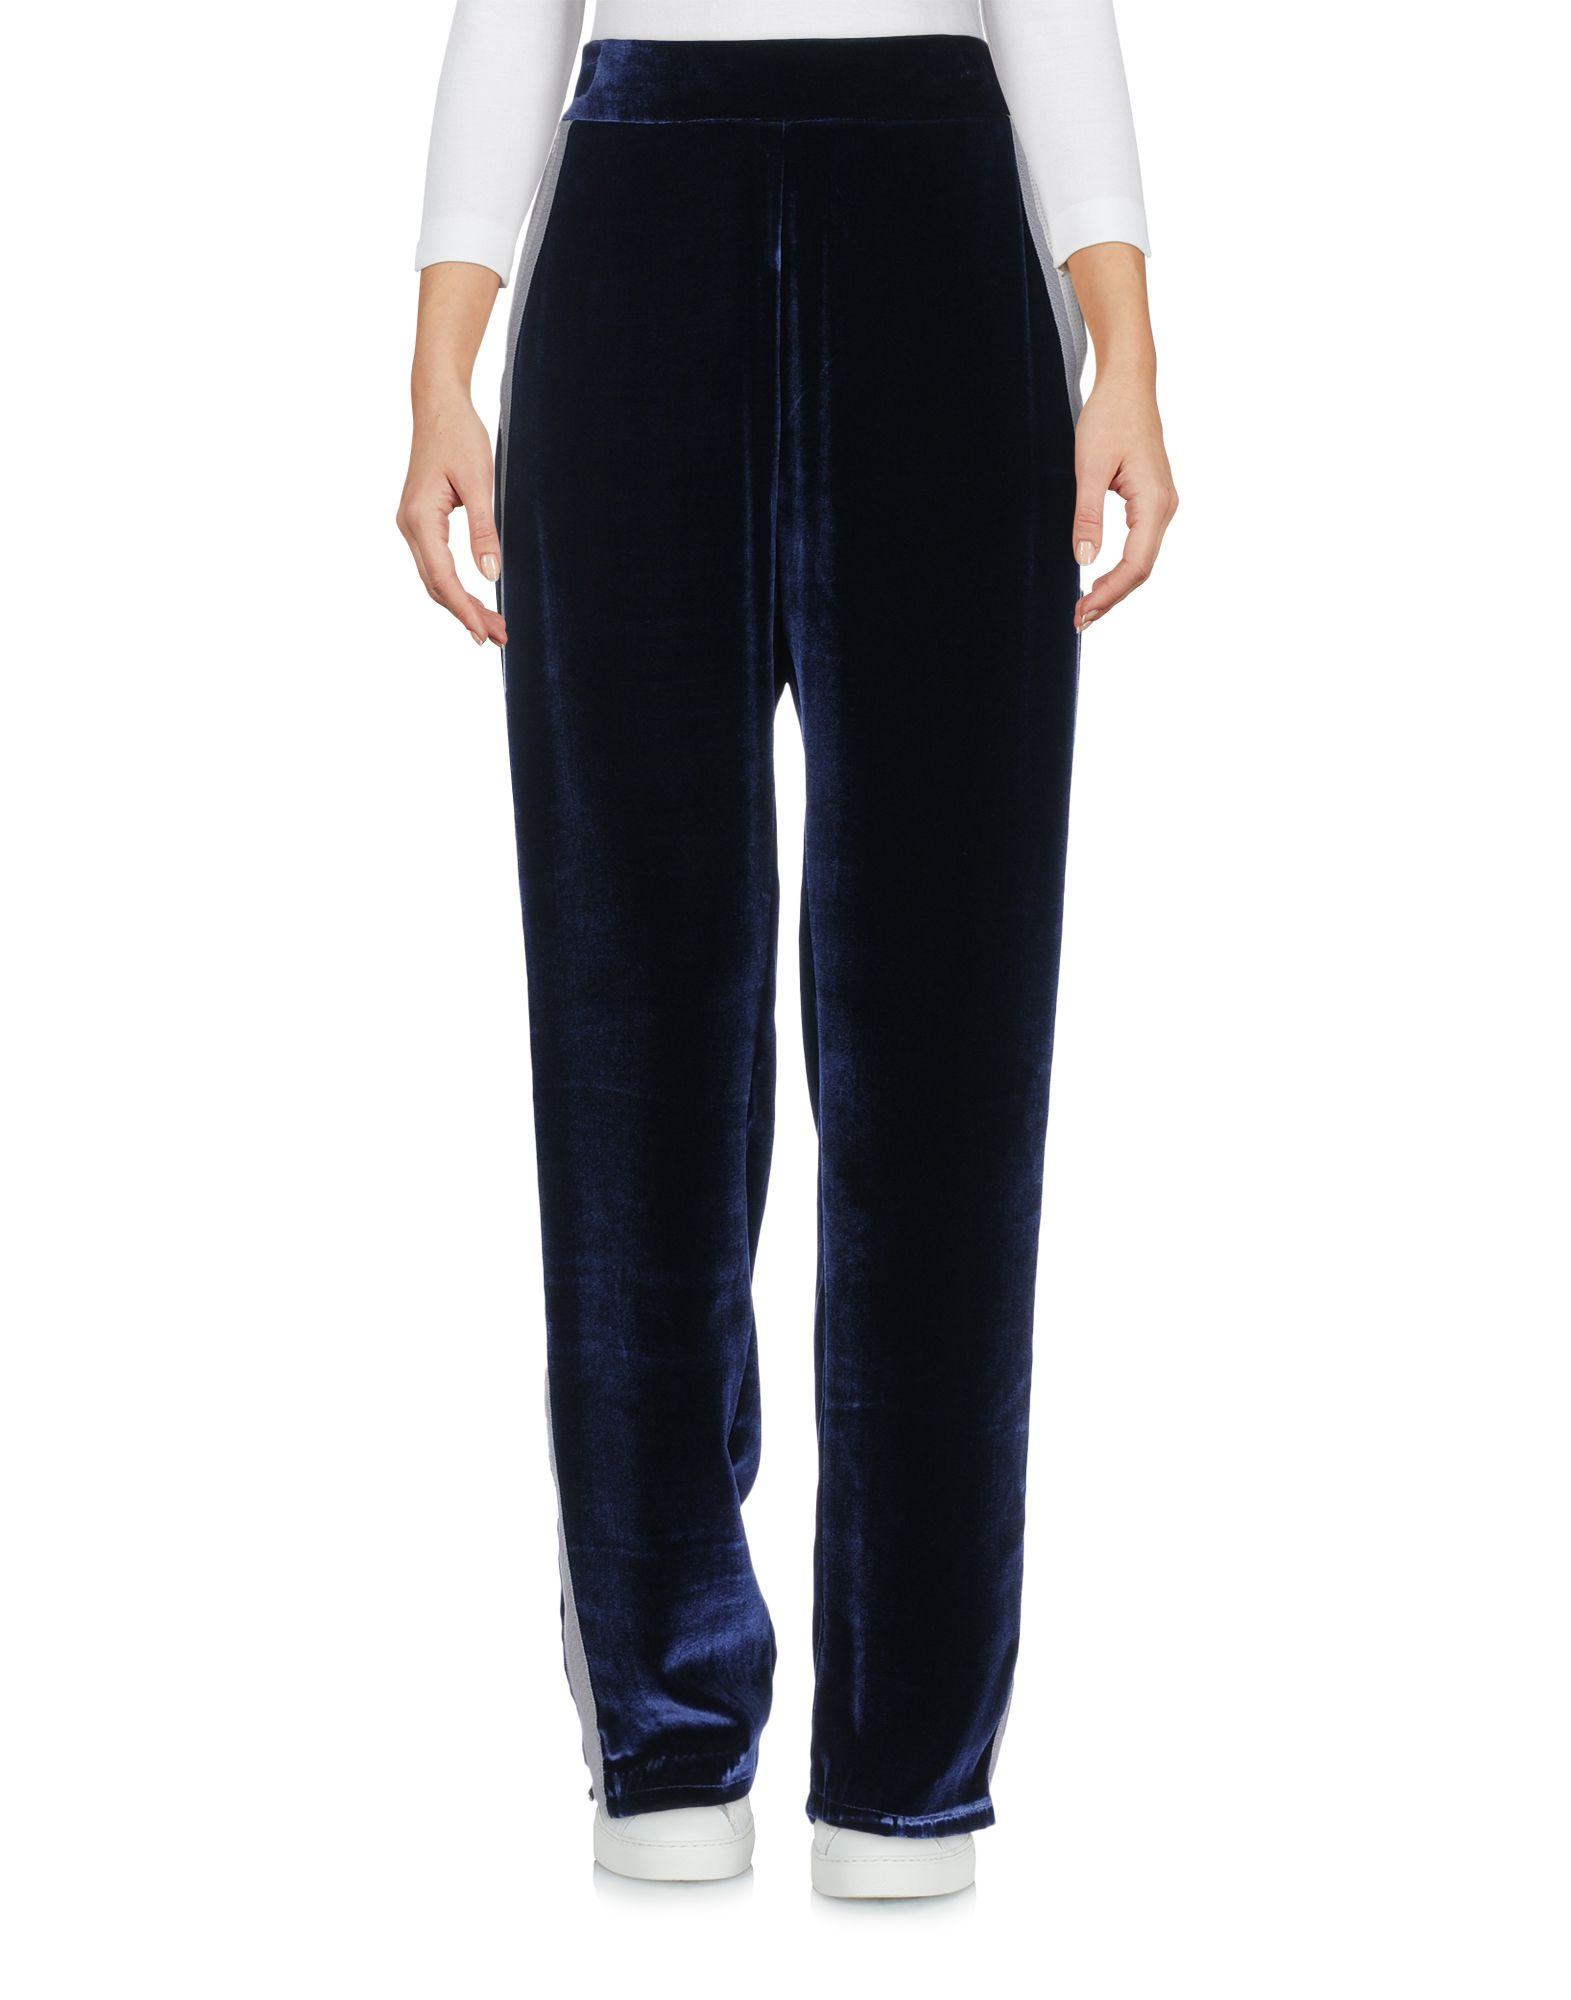 Pantalone Aviù Donna - Acquista online su xRM0HVN